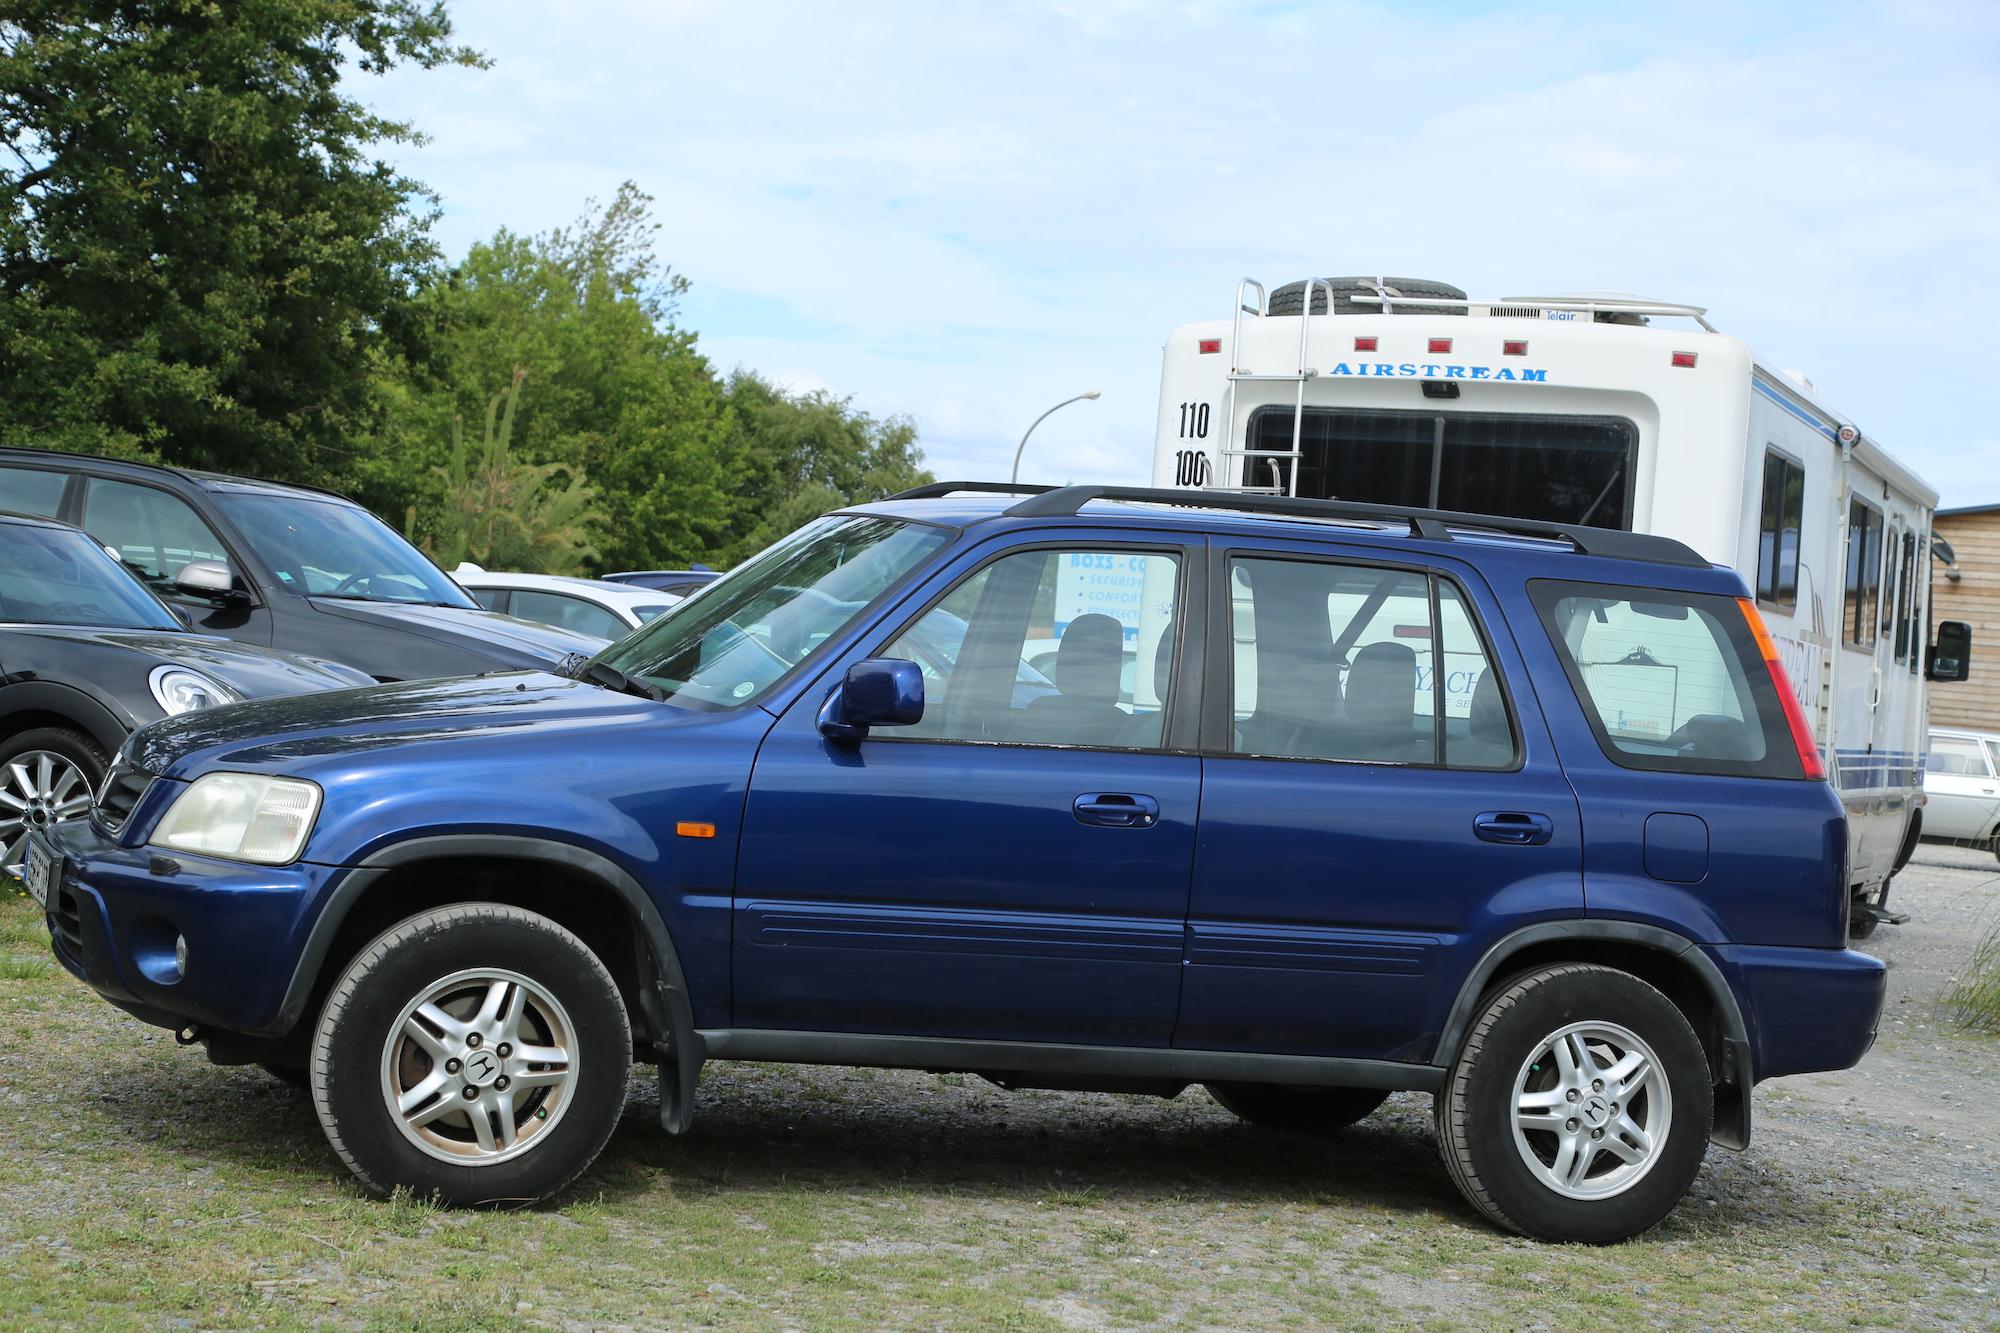 A vendre Honda CRV break 4x4 de 1999